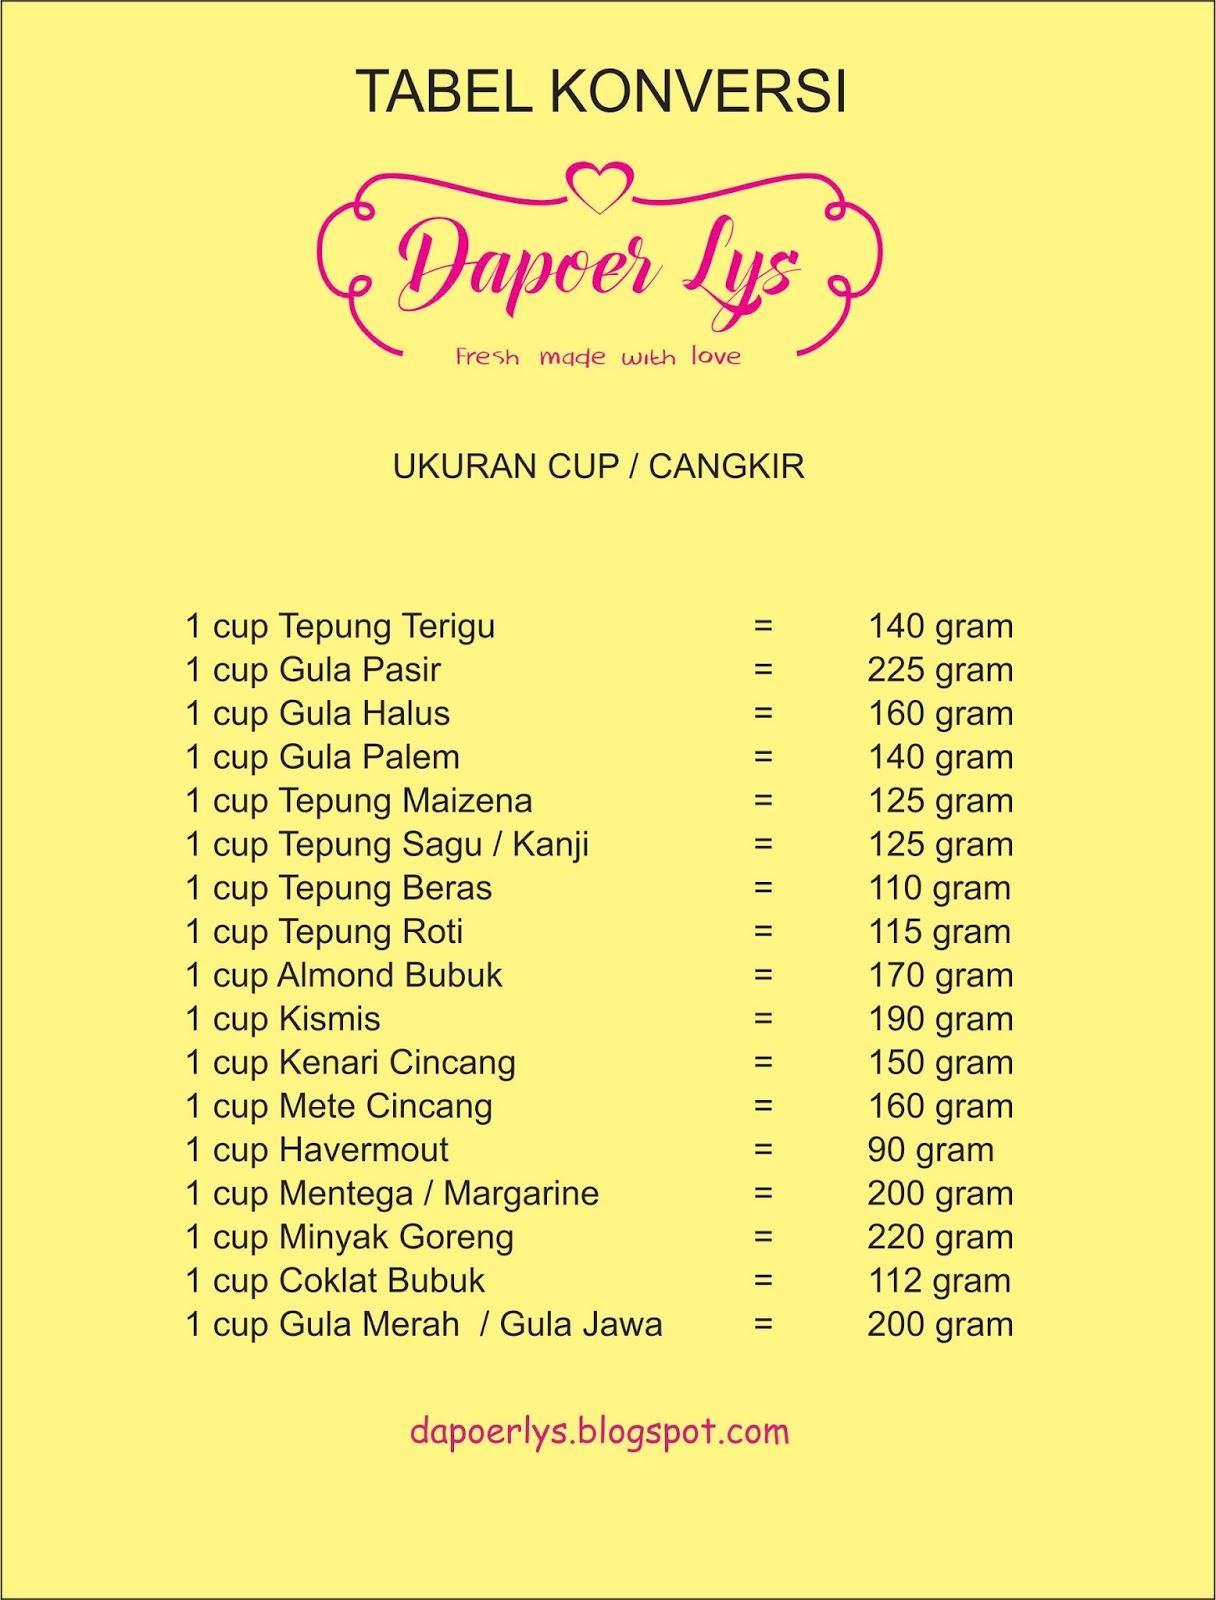 Takaran Tepung Dalam Gelas : takaran, tepung, dalam, gelas, Aurajelita's, Kitchen:, KONVERSI, BERAT, VOLUME, BAHAN-BAHAN